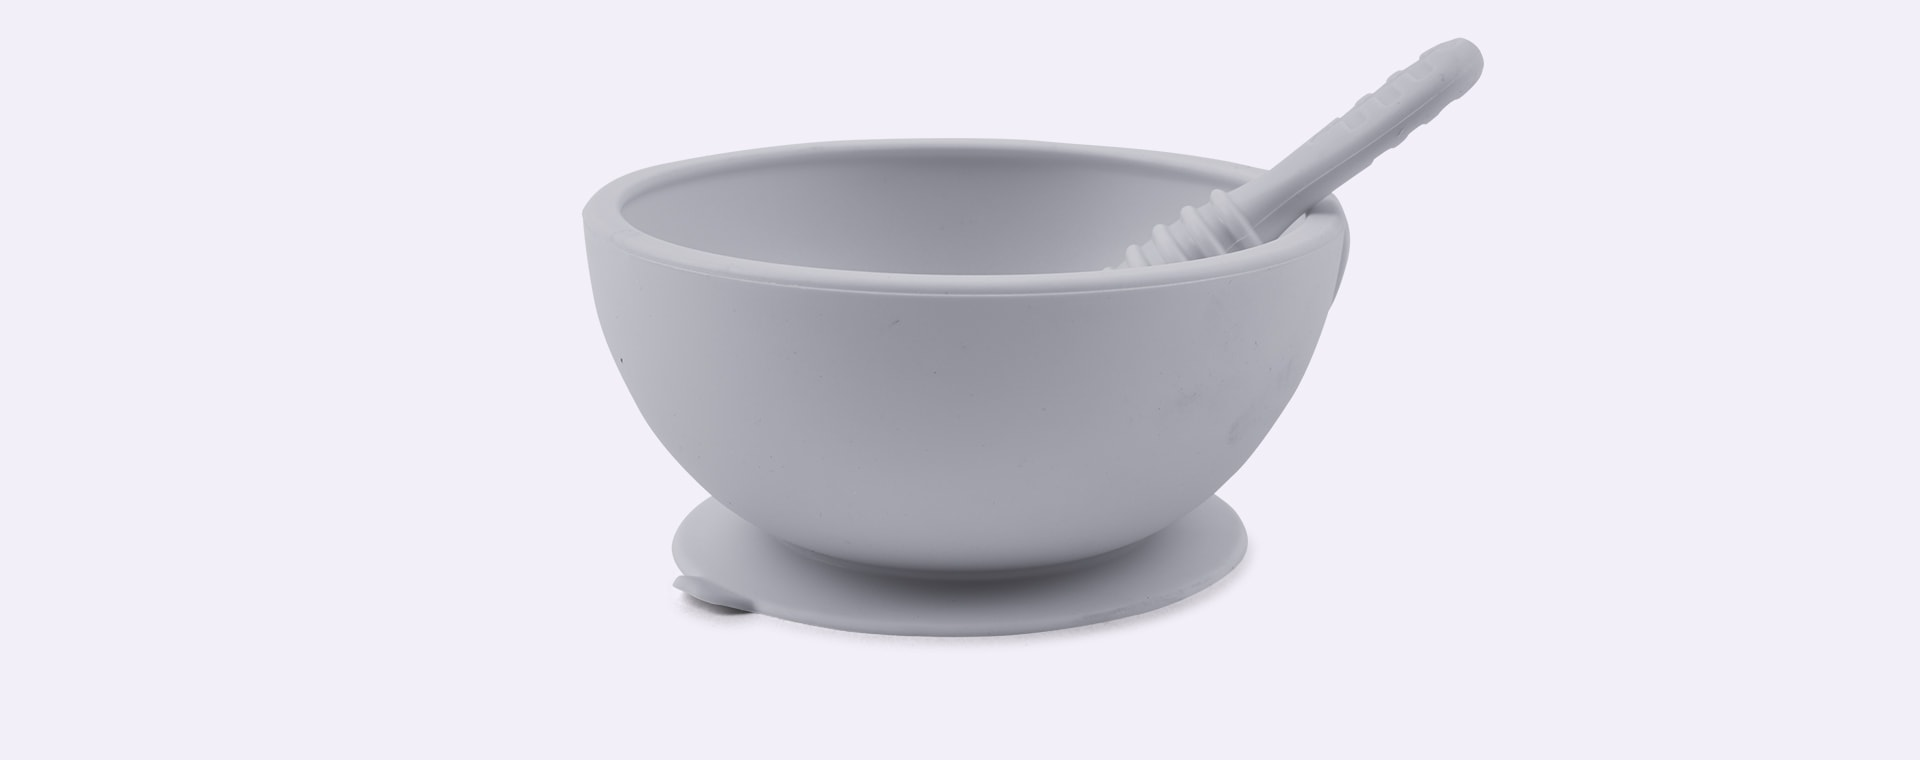 Grey Bumkins Suction Silicone Baby First Feeding Set